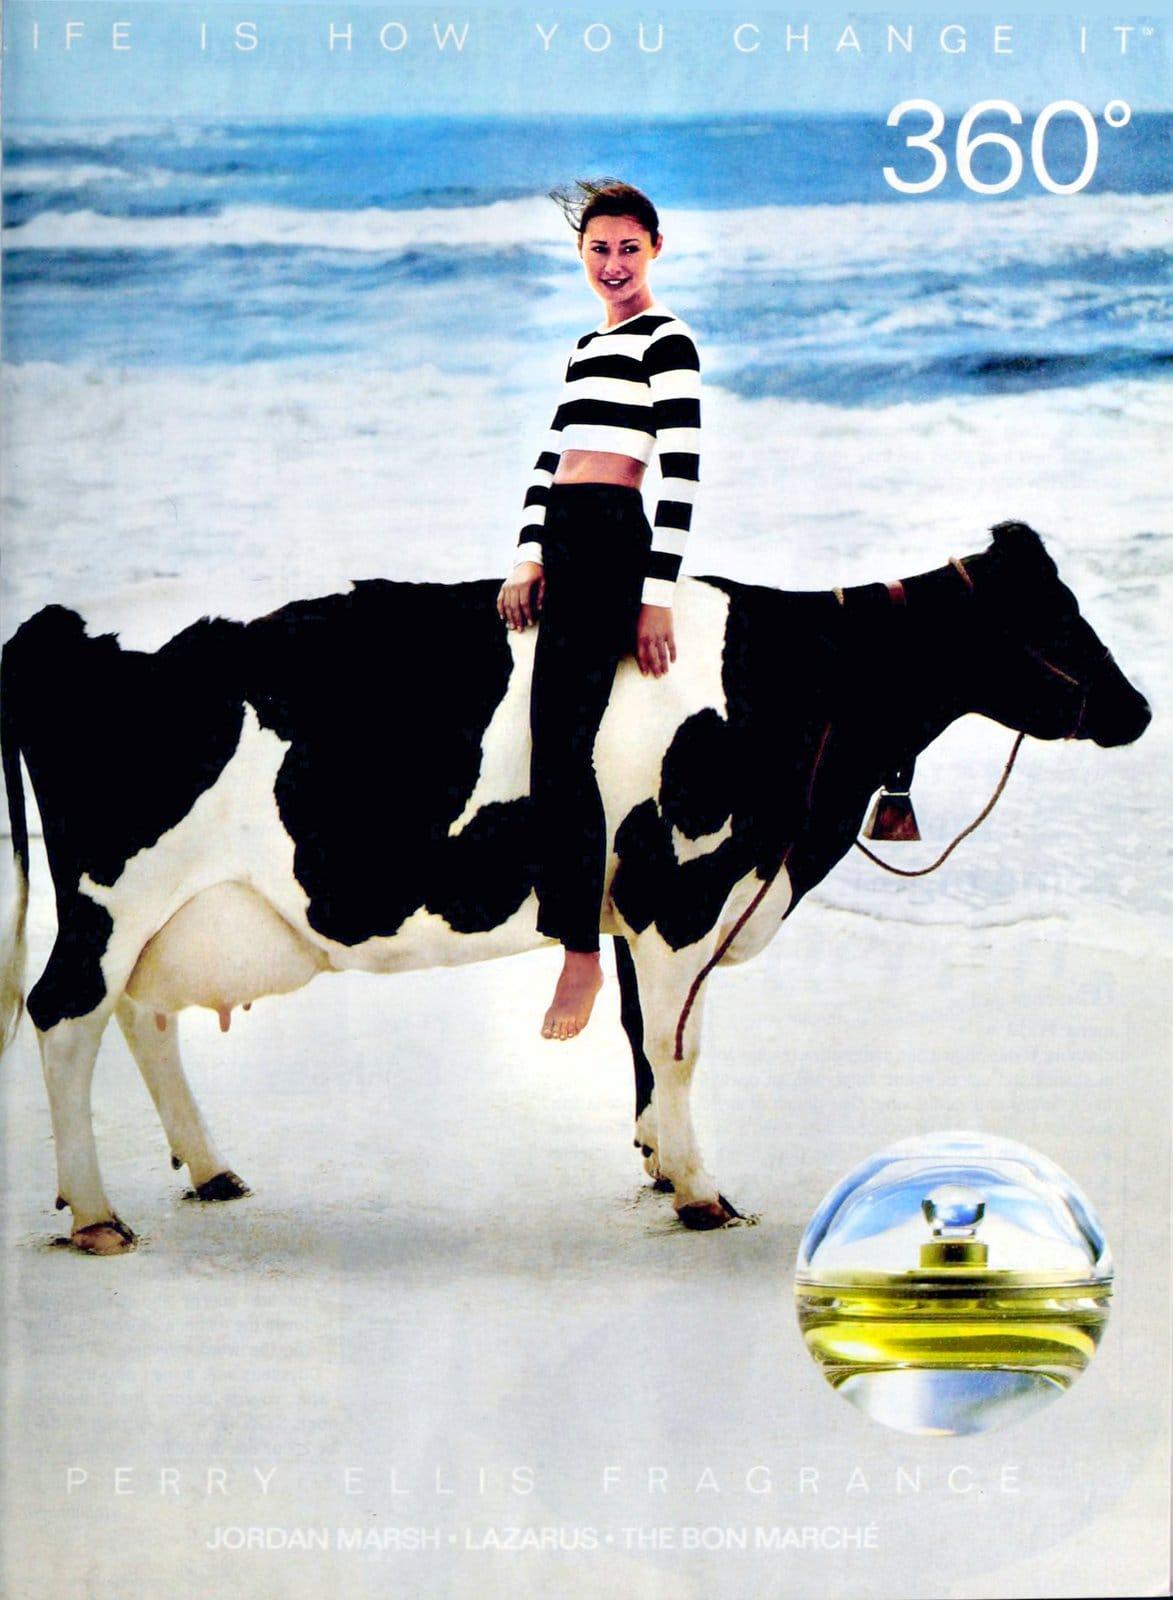 360 vintage fragrance from Perry Ellis (1993) at ClickAmericana com